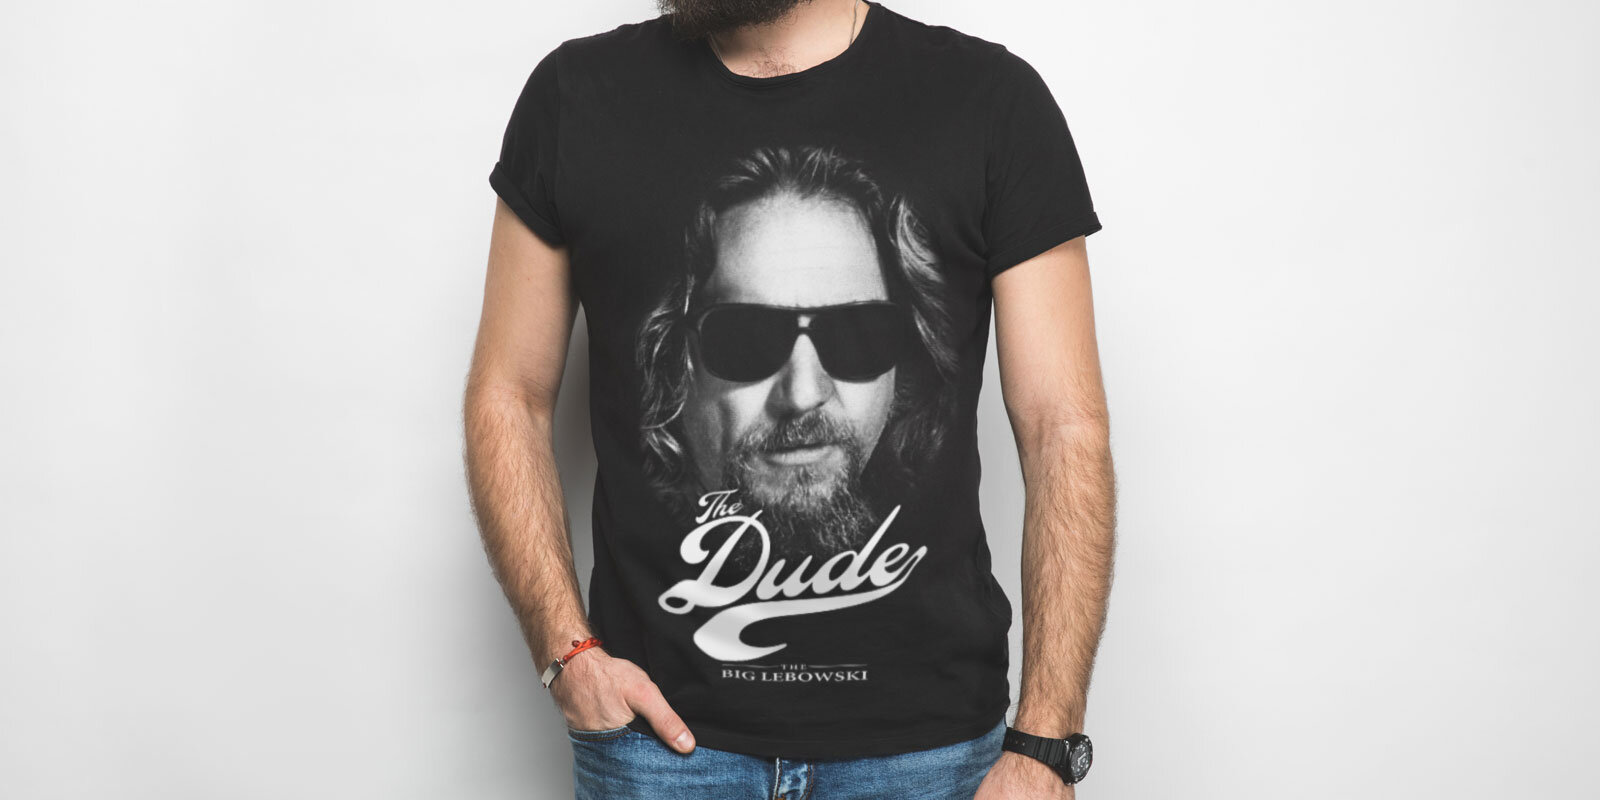 https://www.shirtstore.no/pub_docs/files/Man/MAN-HalfLeft-Lebowski.jpg